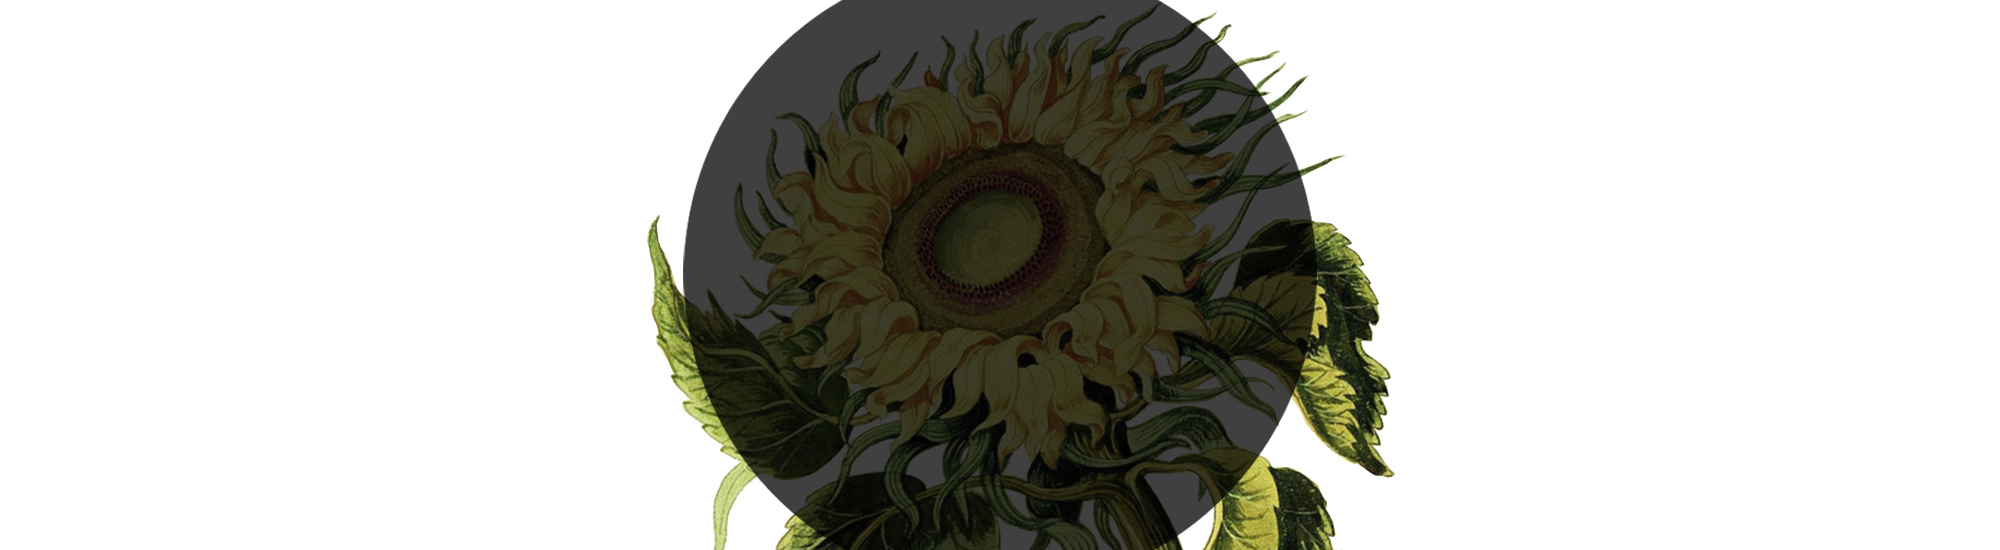 Незнайомий соняшник